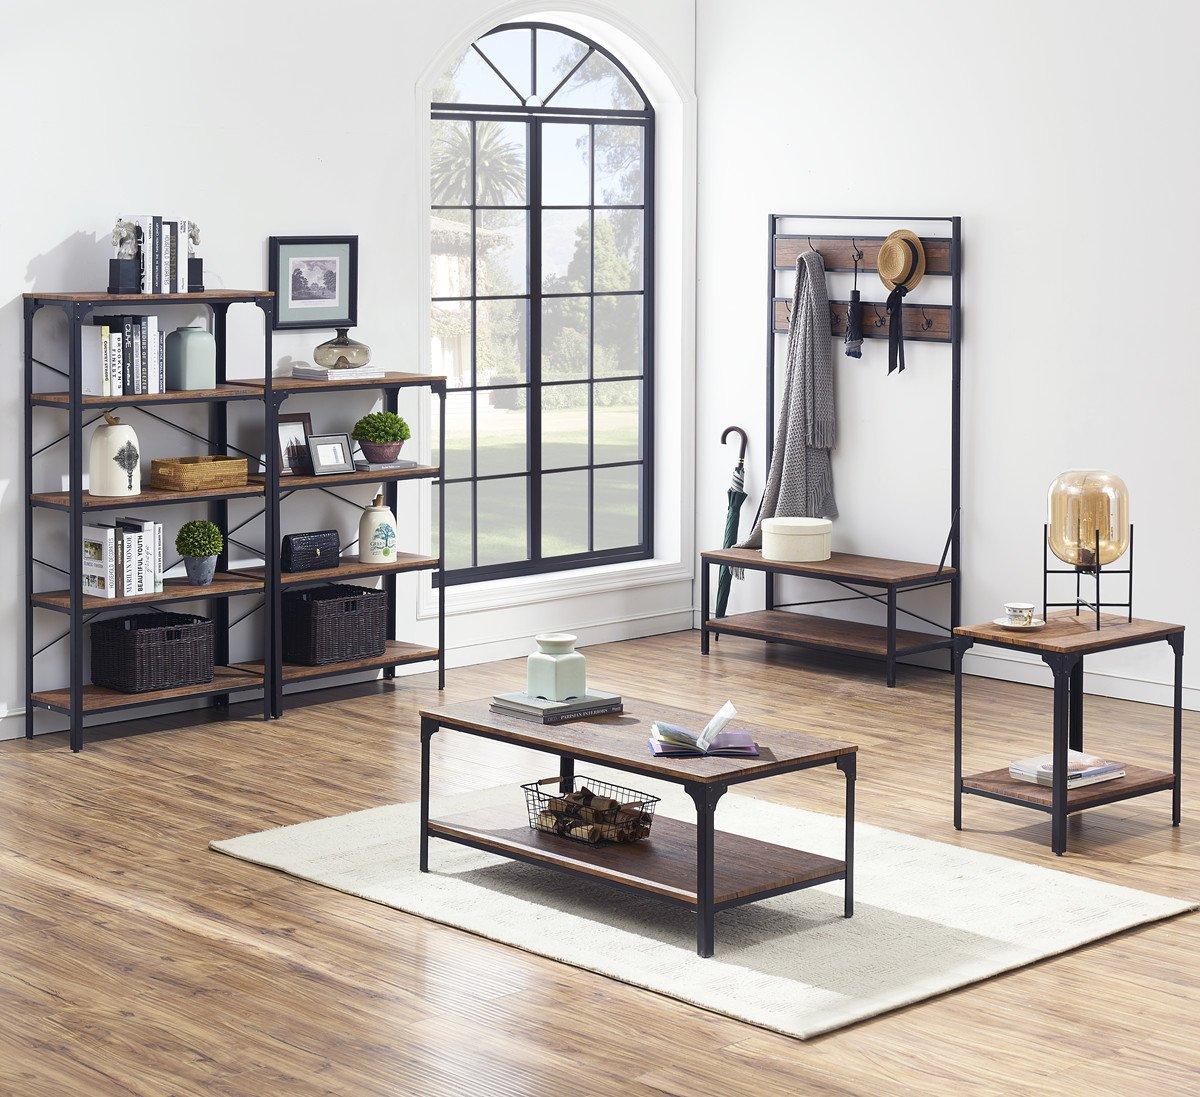 "O&K Furniture 4-Shelf Industrial Vintage Bookcase, Metal Bookshelf, 48""H x 33""W x 13""D, Barn-Wood Finish by O&K Furniture (Image #10)"